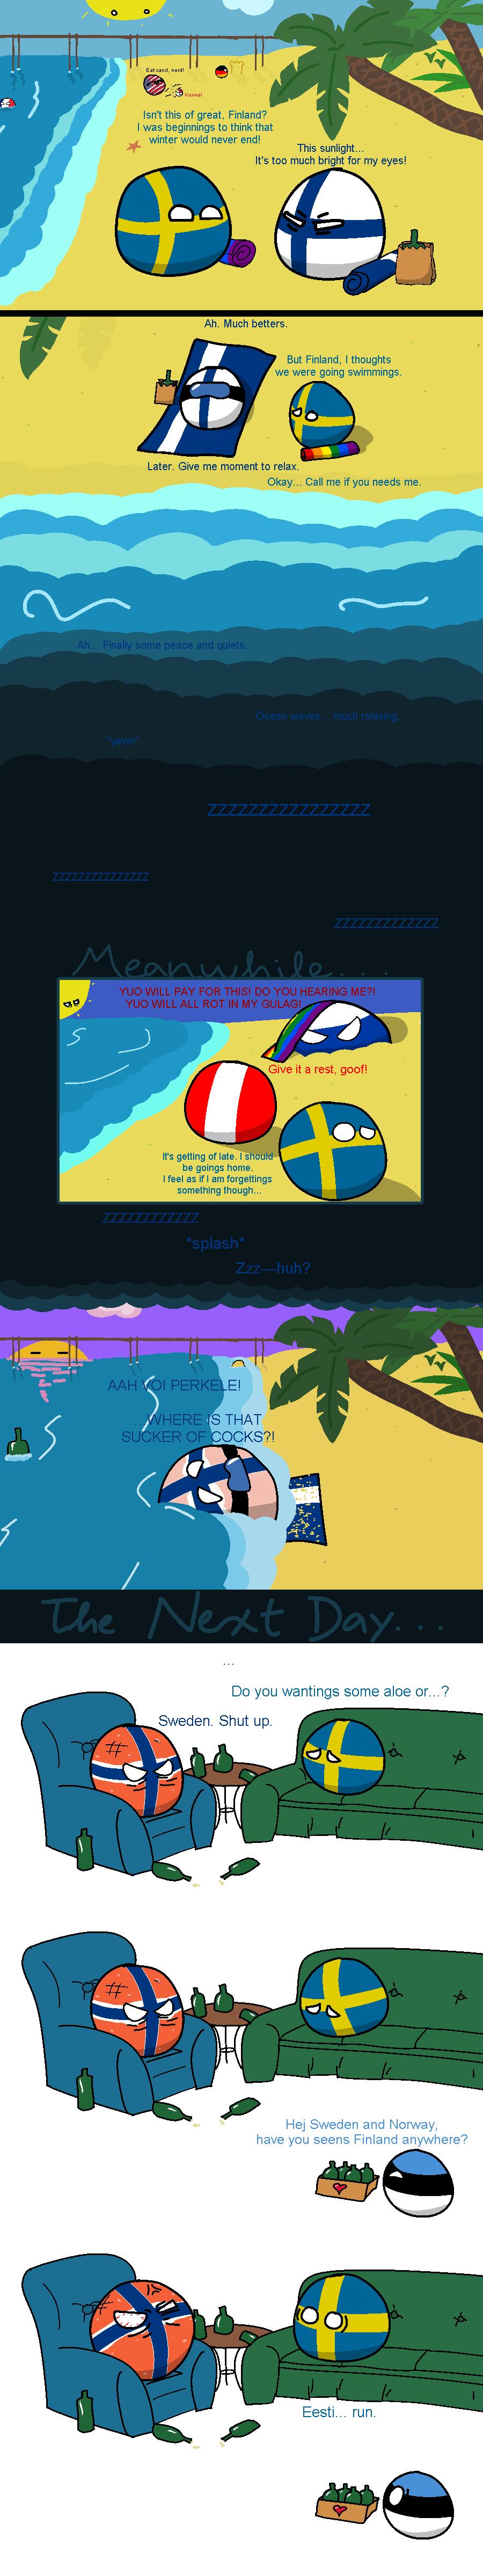 Is Estonia A Nordic Country